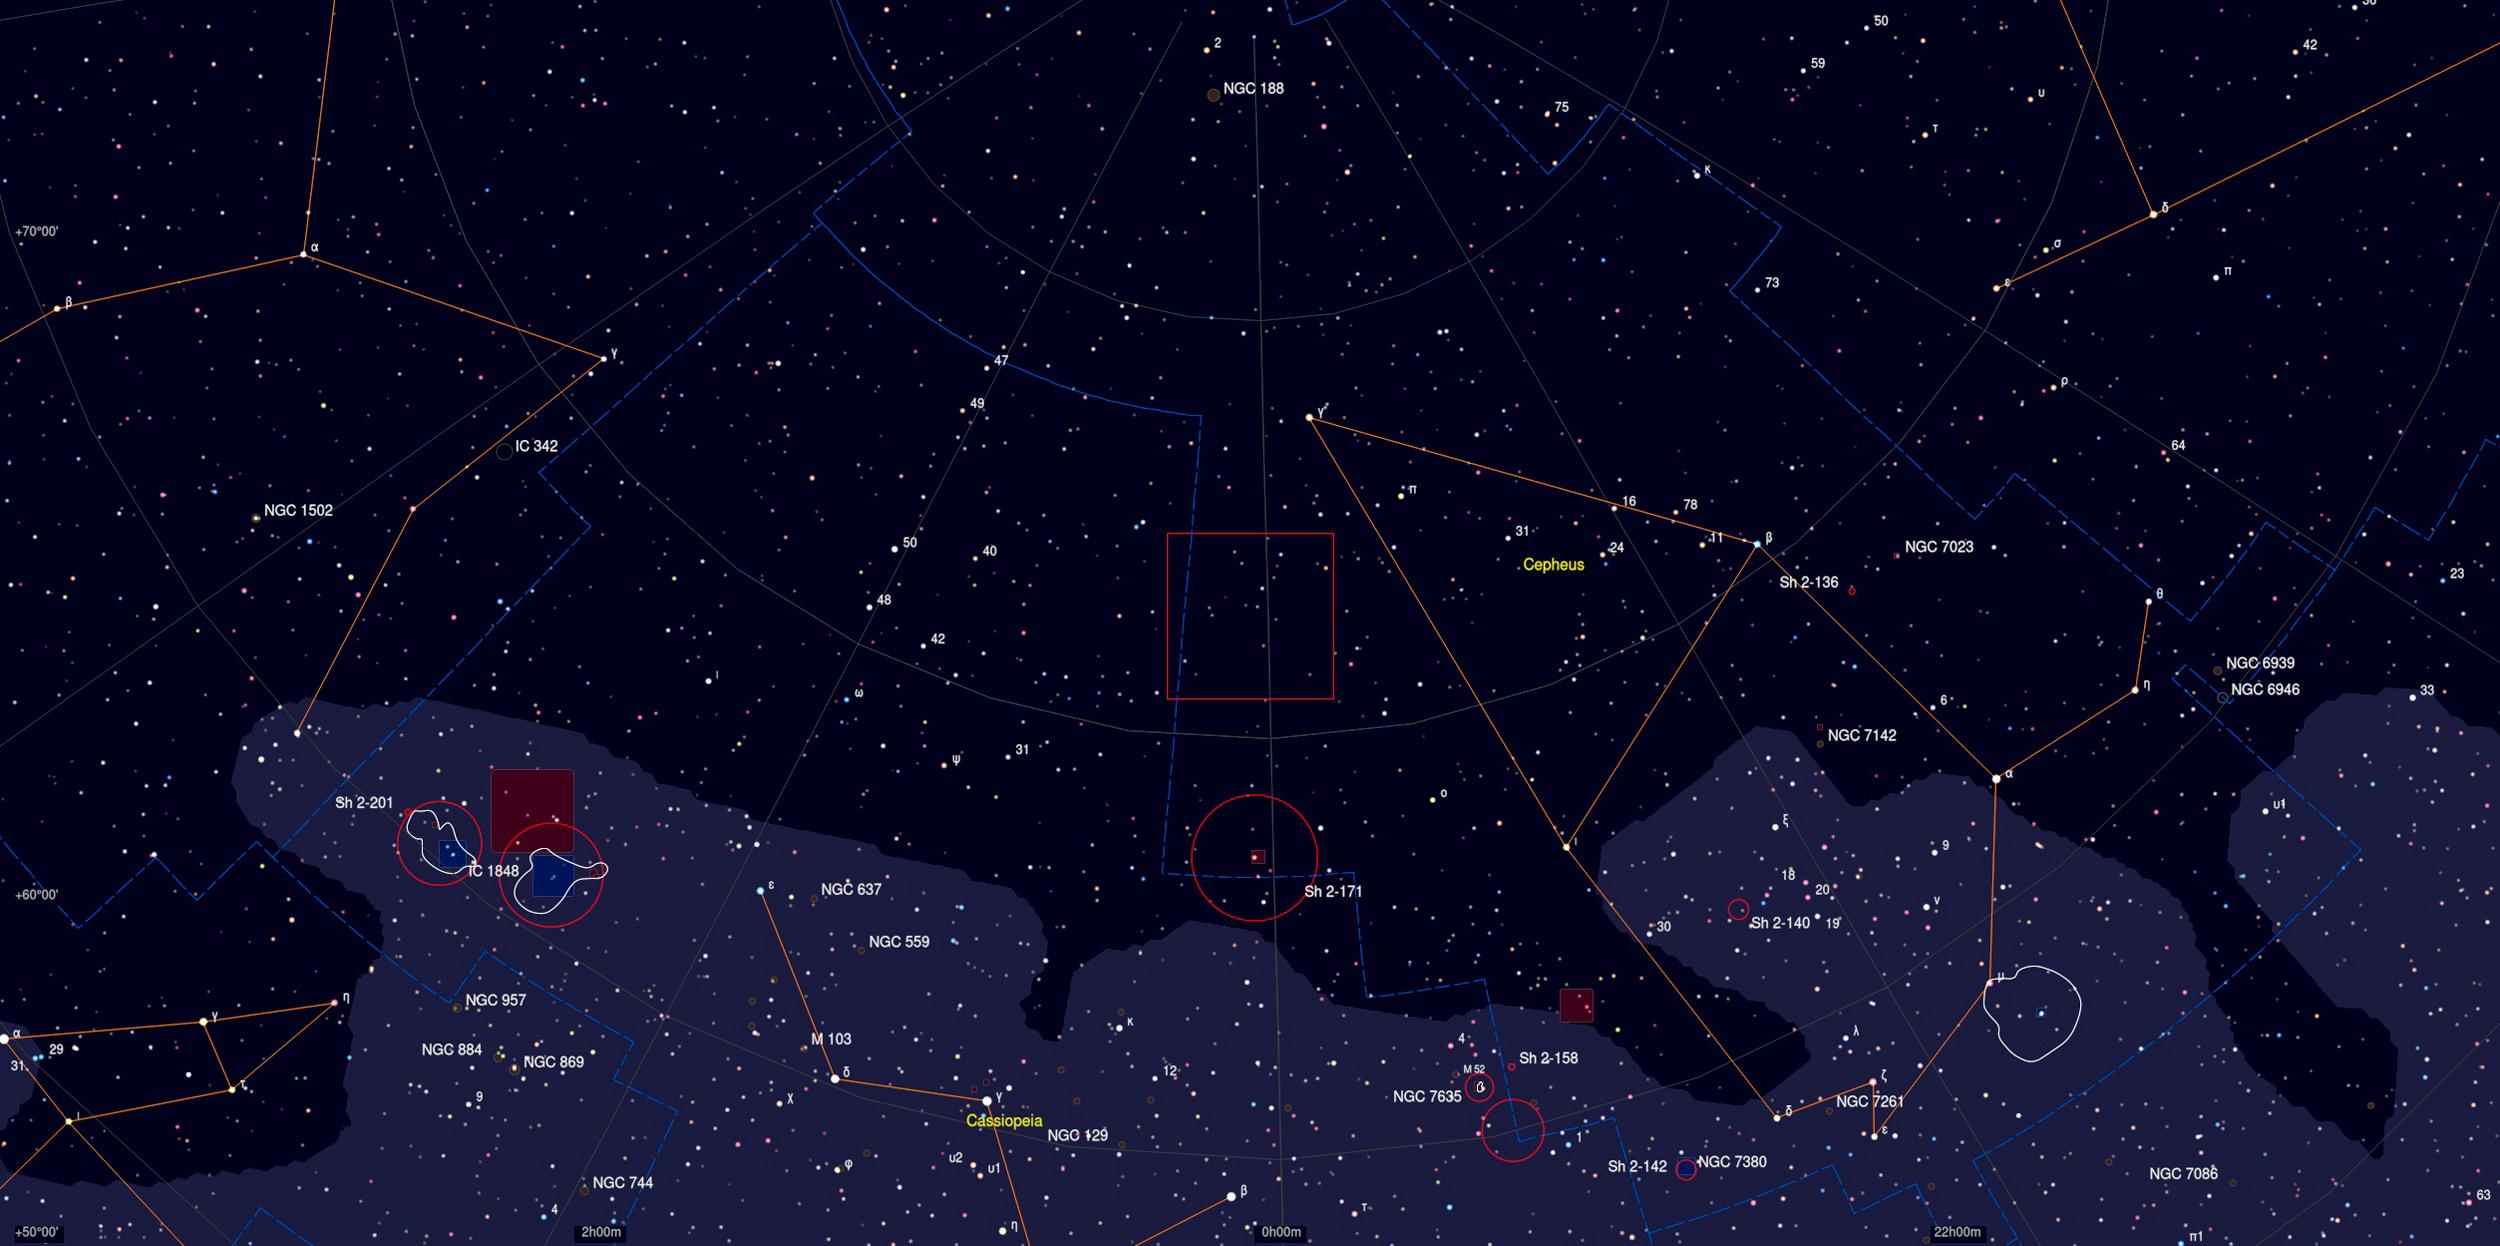 CTA 1 Sky Chart - Astrophotography Martin Rusterholz